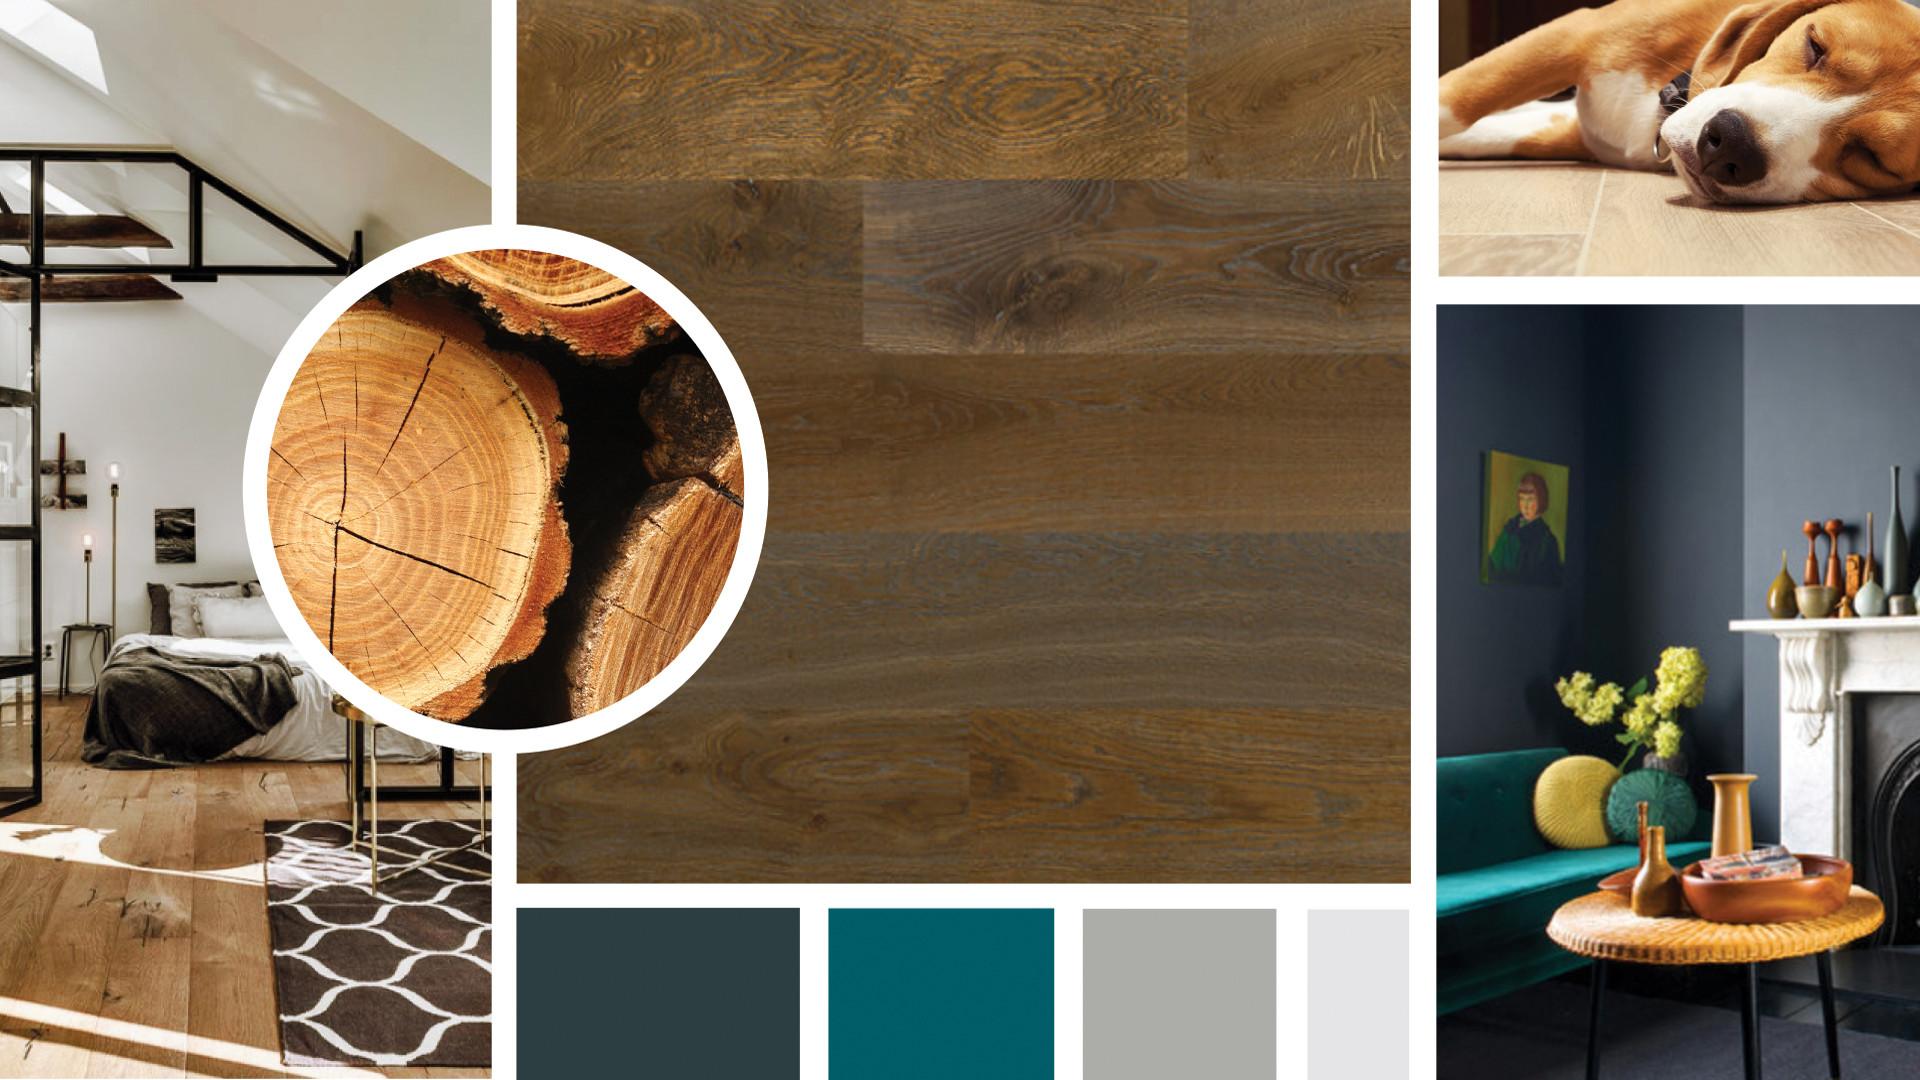 most popular engineered hardwood flooring color of 4 latest hardwood flooring trends of 2018 lauzon flooring with new hardwood floorings